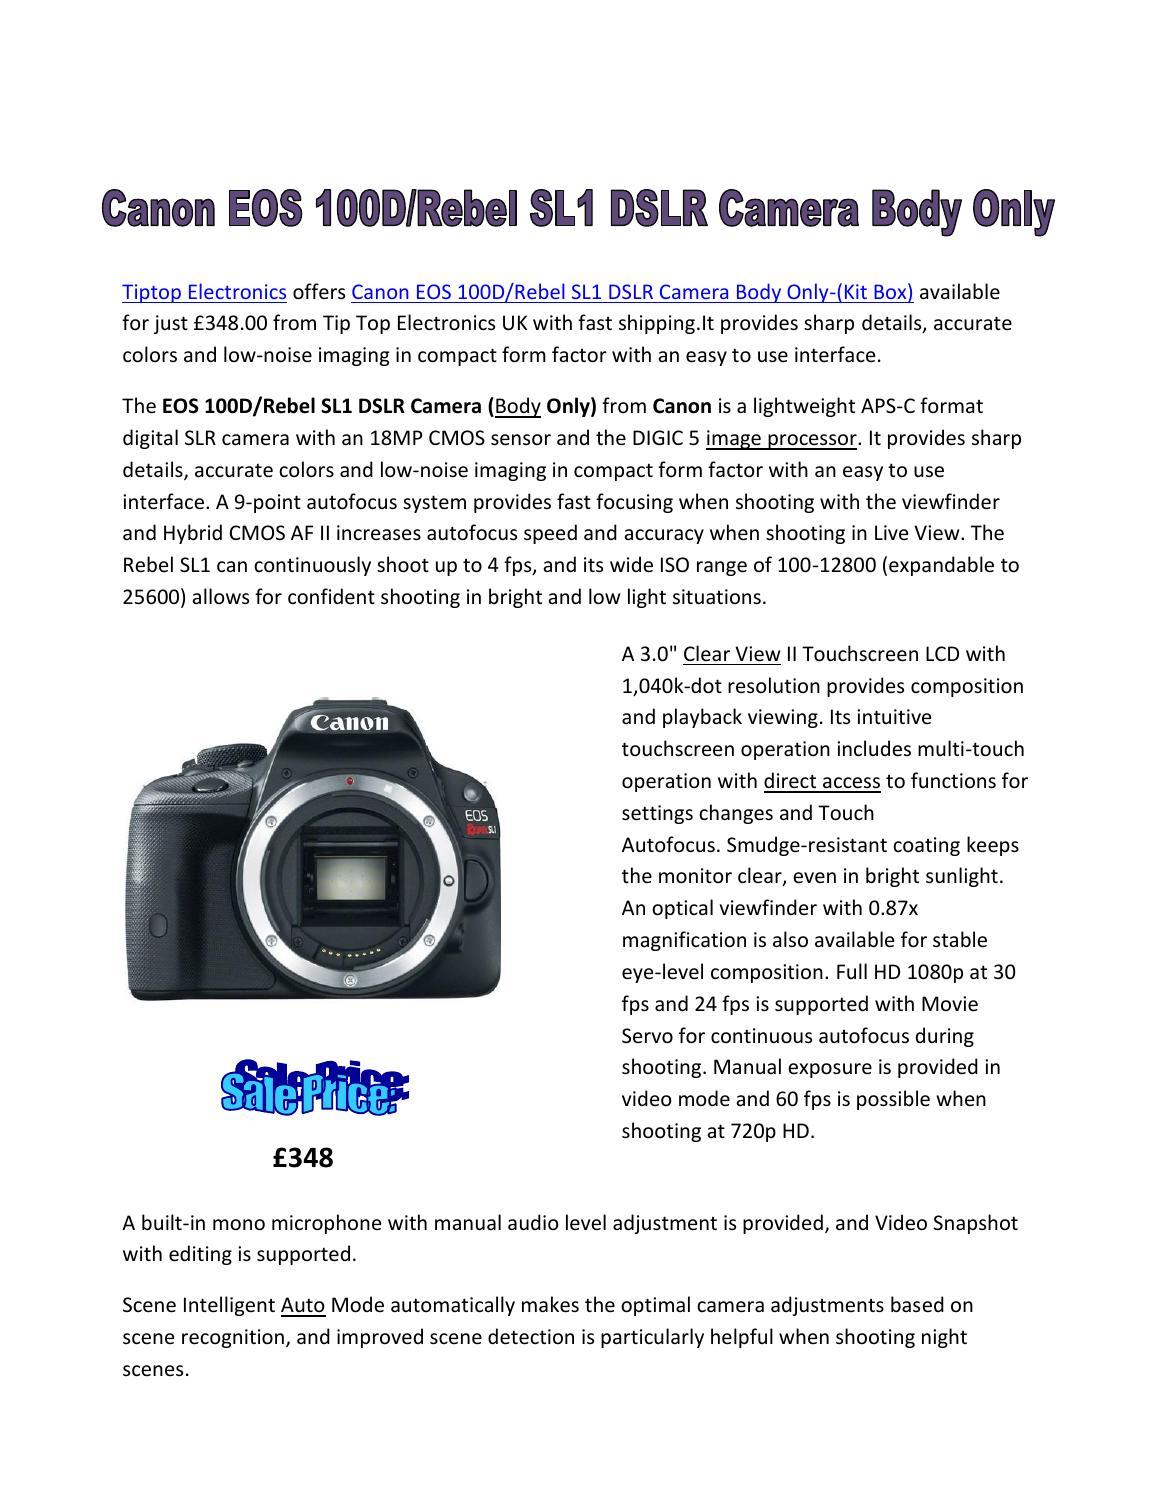 Canon Eos 100drebel Sl1 Dslr Camera Body Only By Calvin Hood Issuu 100d